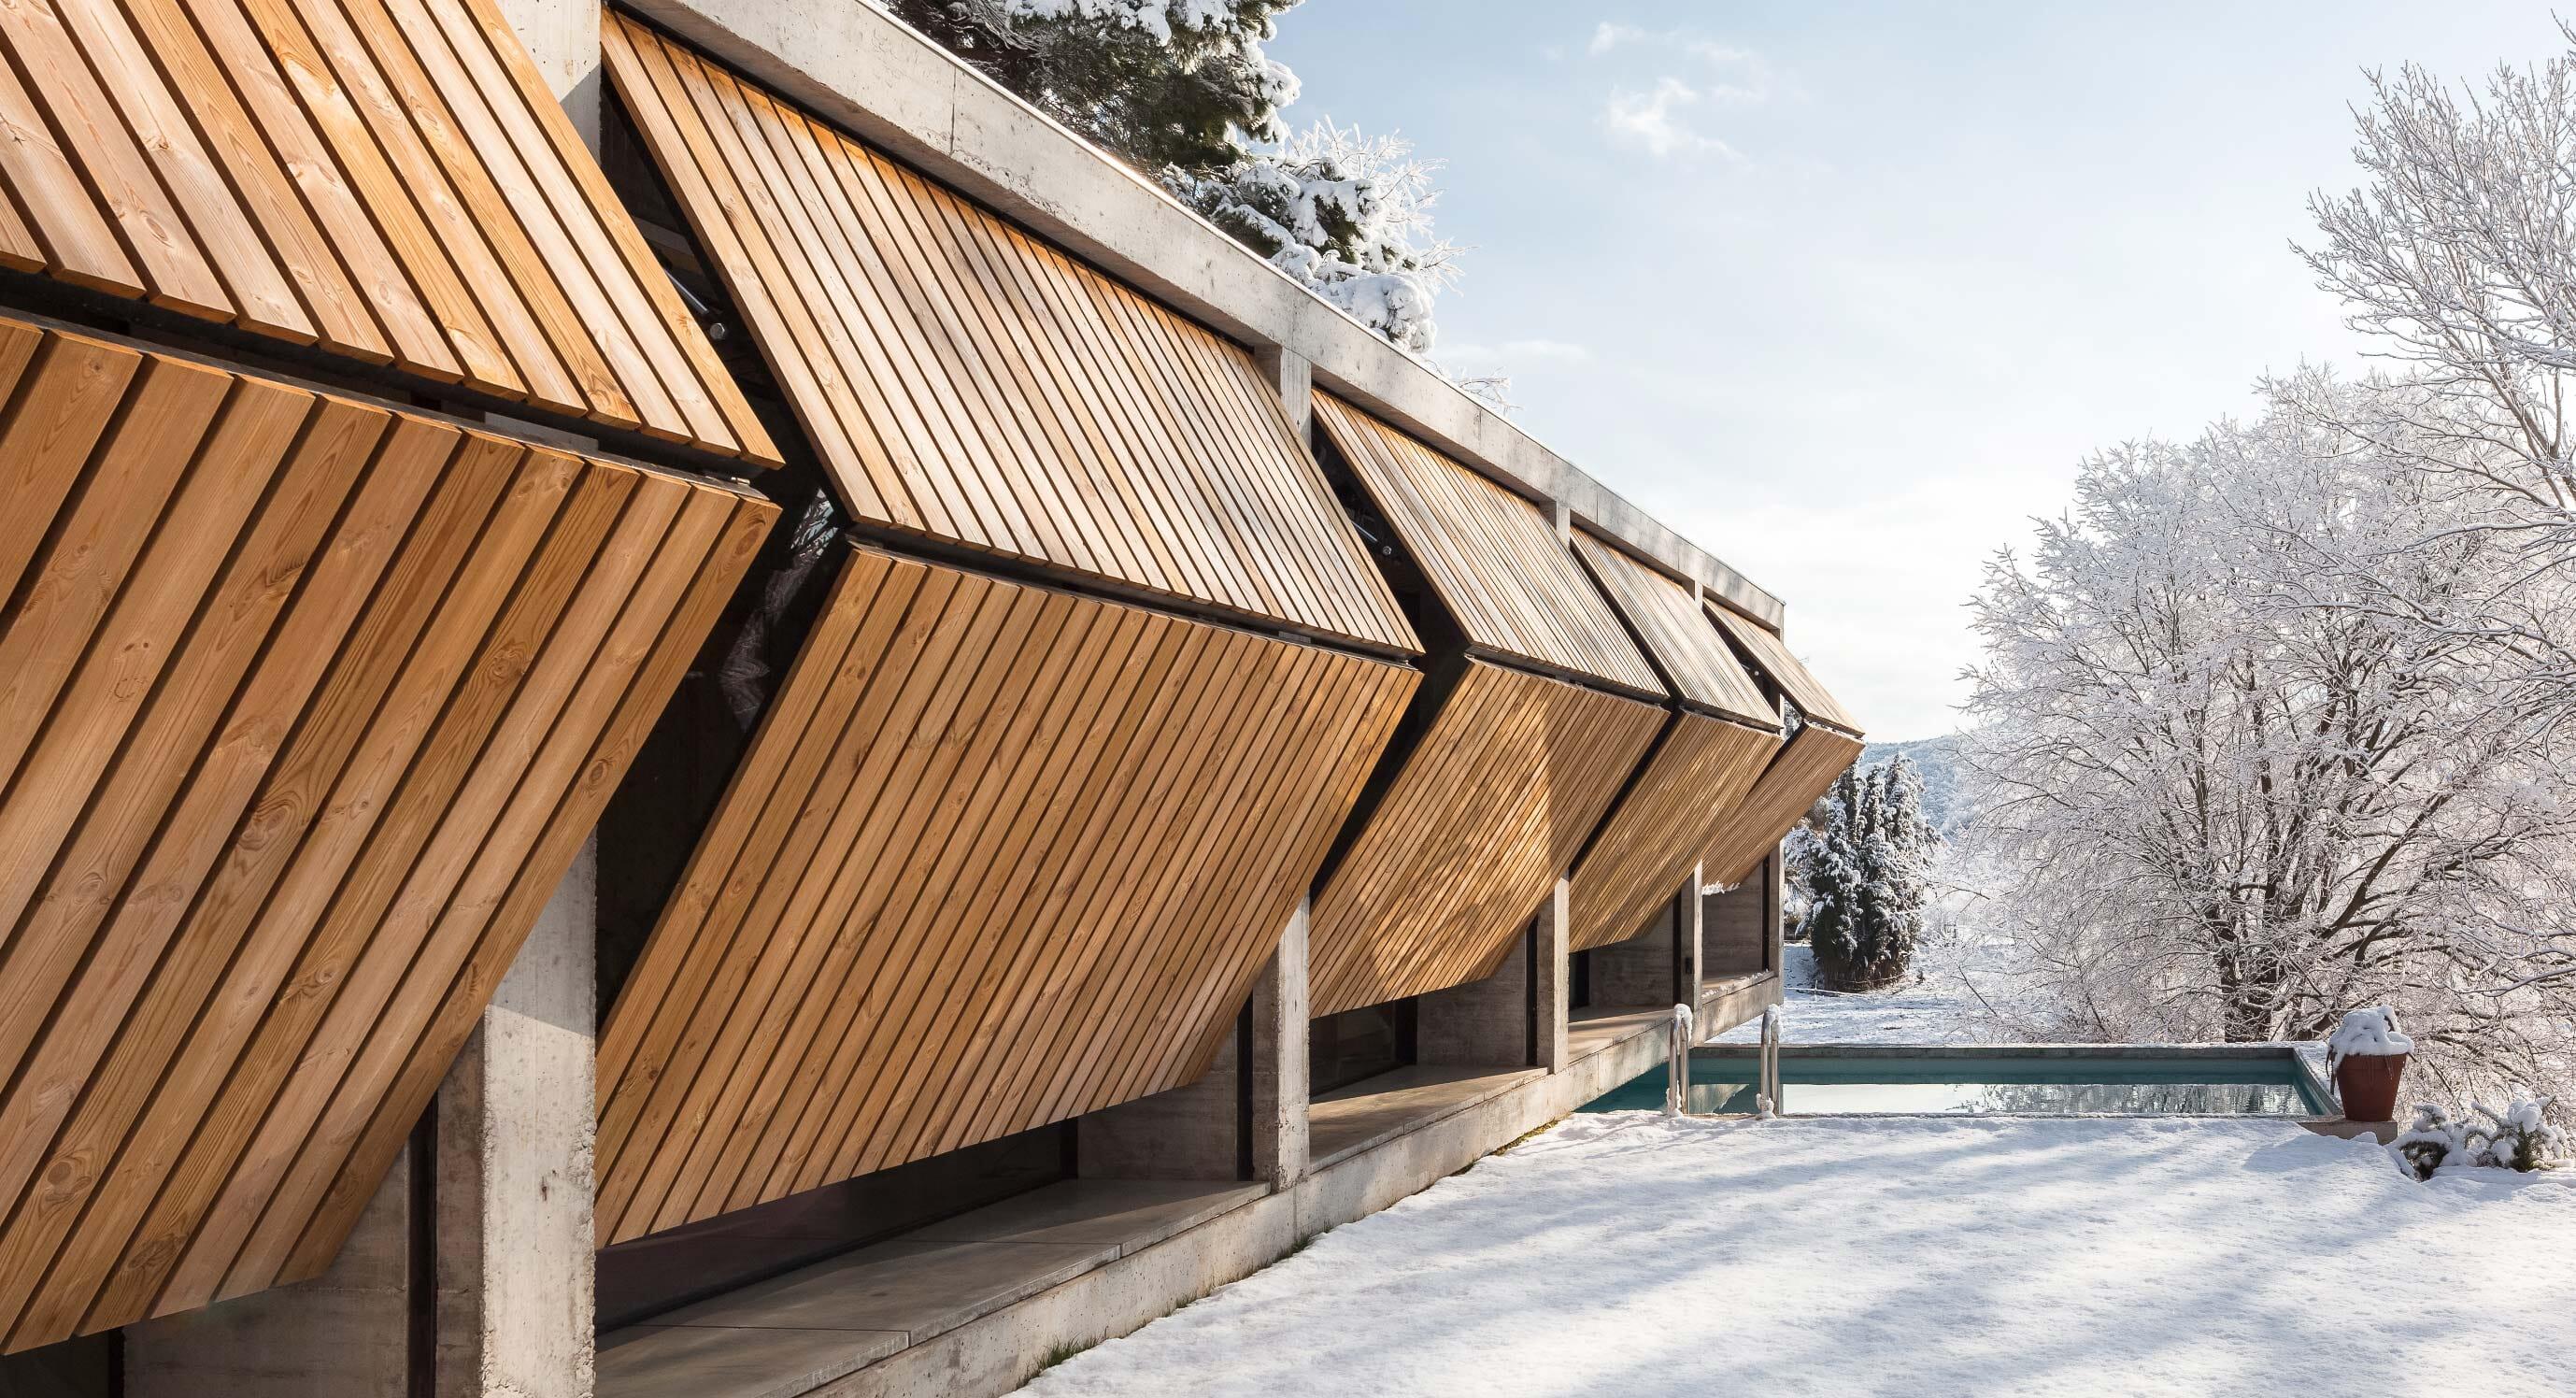 Retina House: Emphasis on surroundings